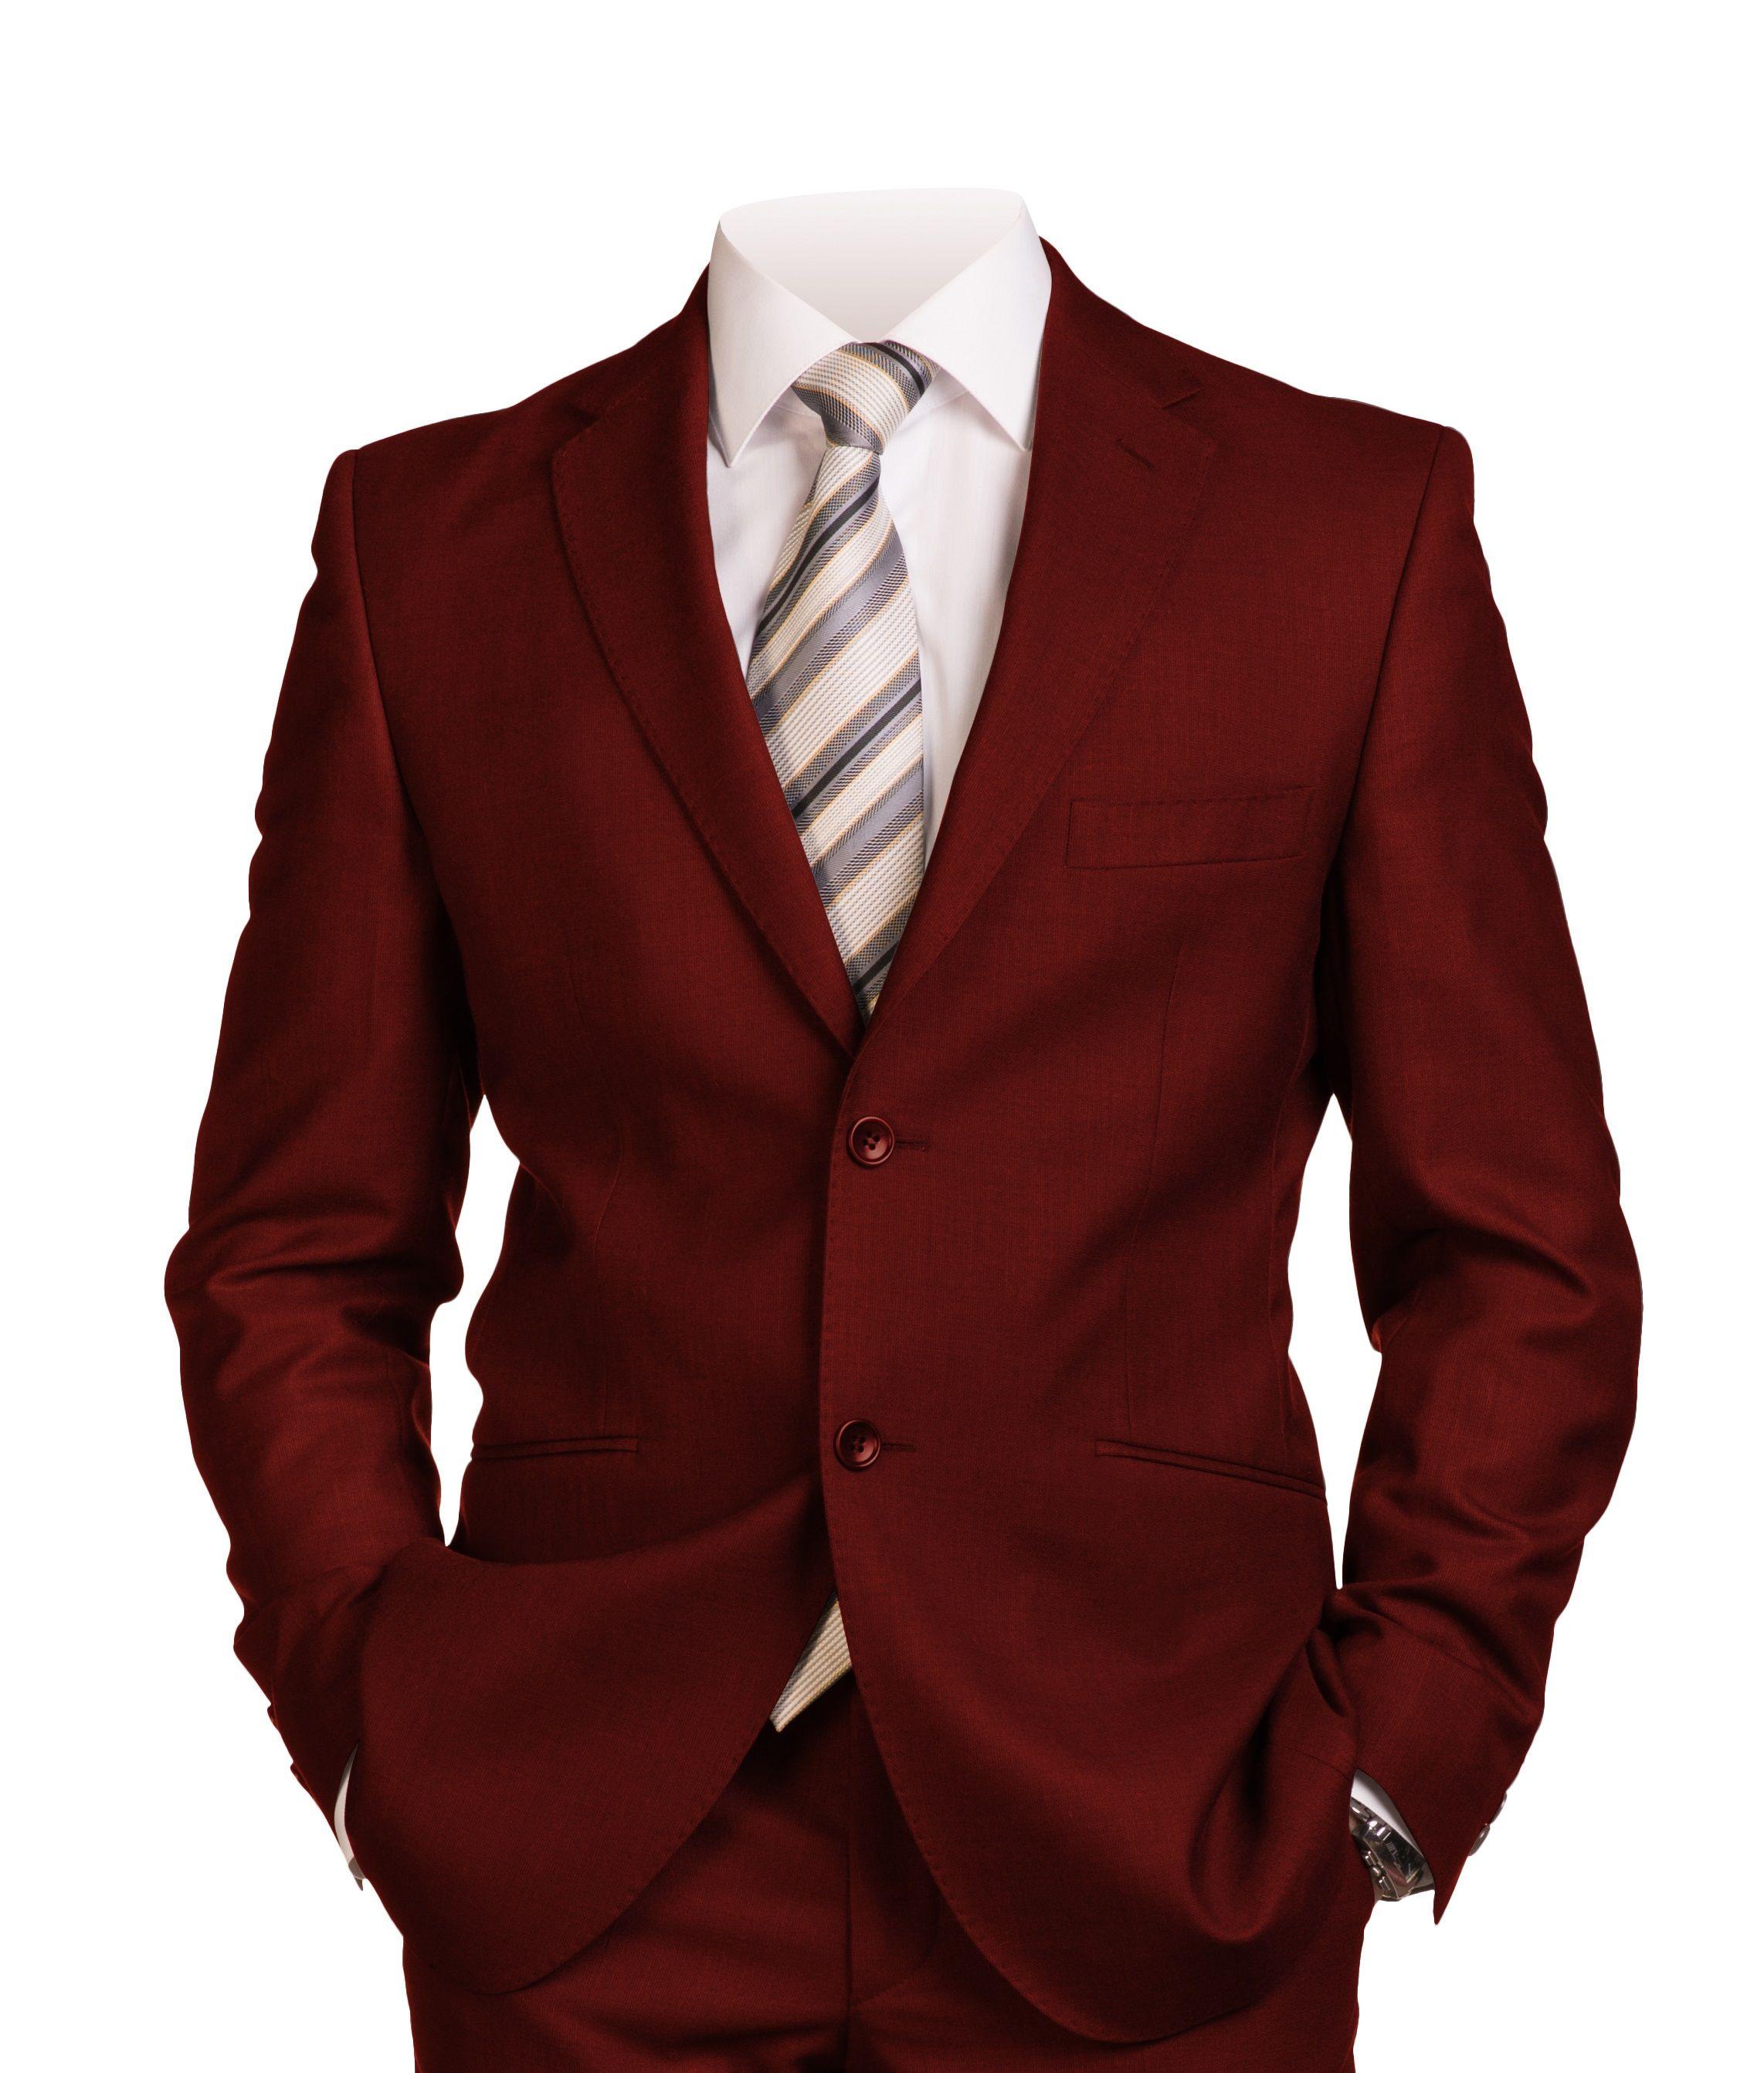 Men's Italian-Style Single-Breasted Suit - Burgundy *BOGO FREE Sale*